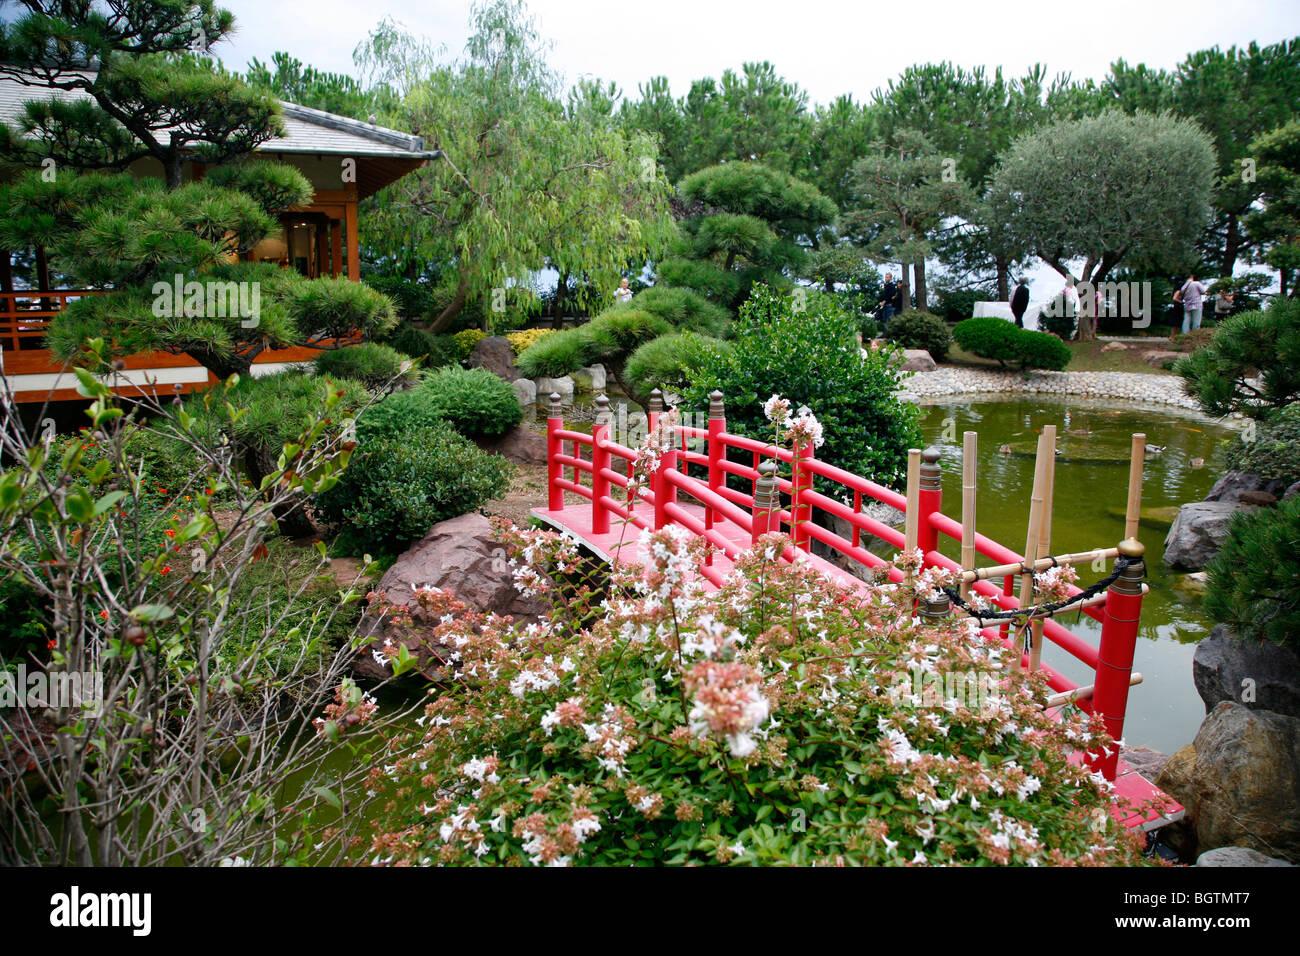 Jardin japonais the japanese gardens in monte carlo for Jardin japonais monaco